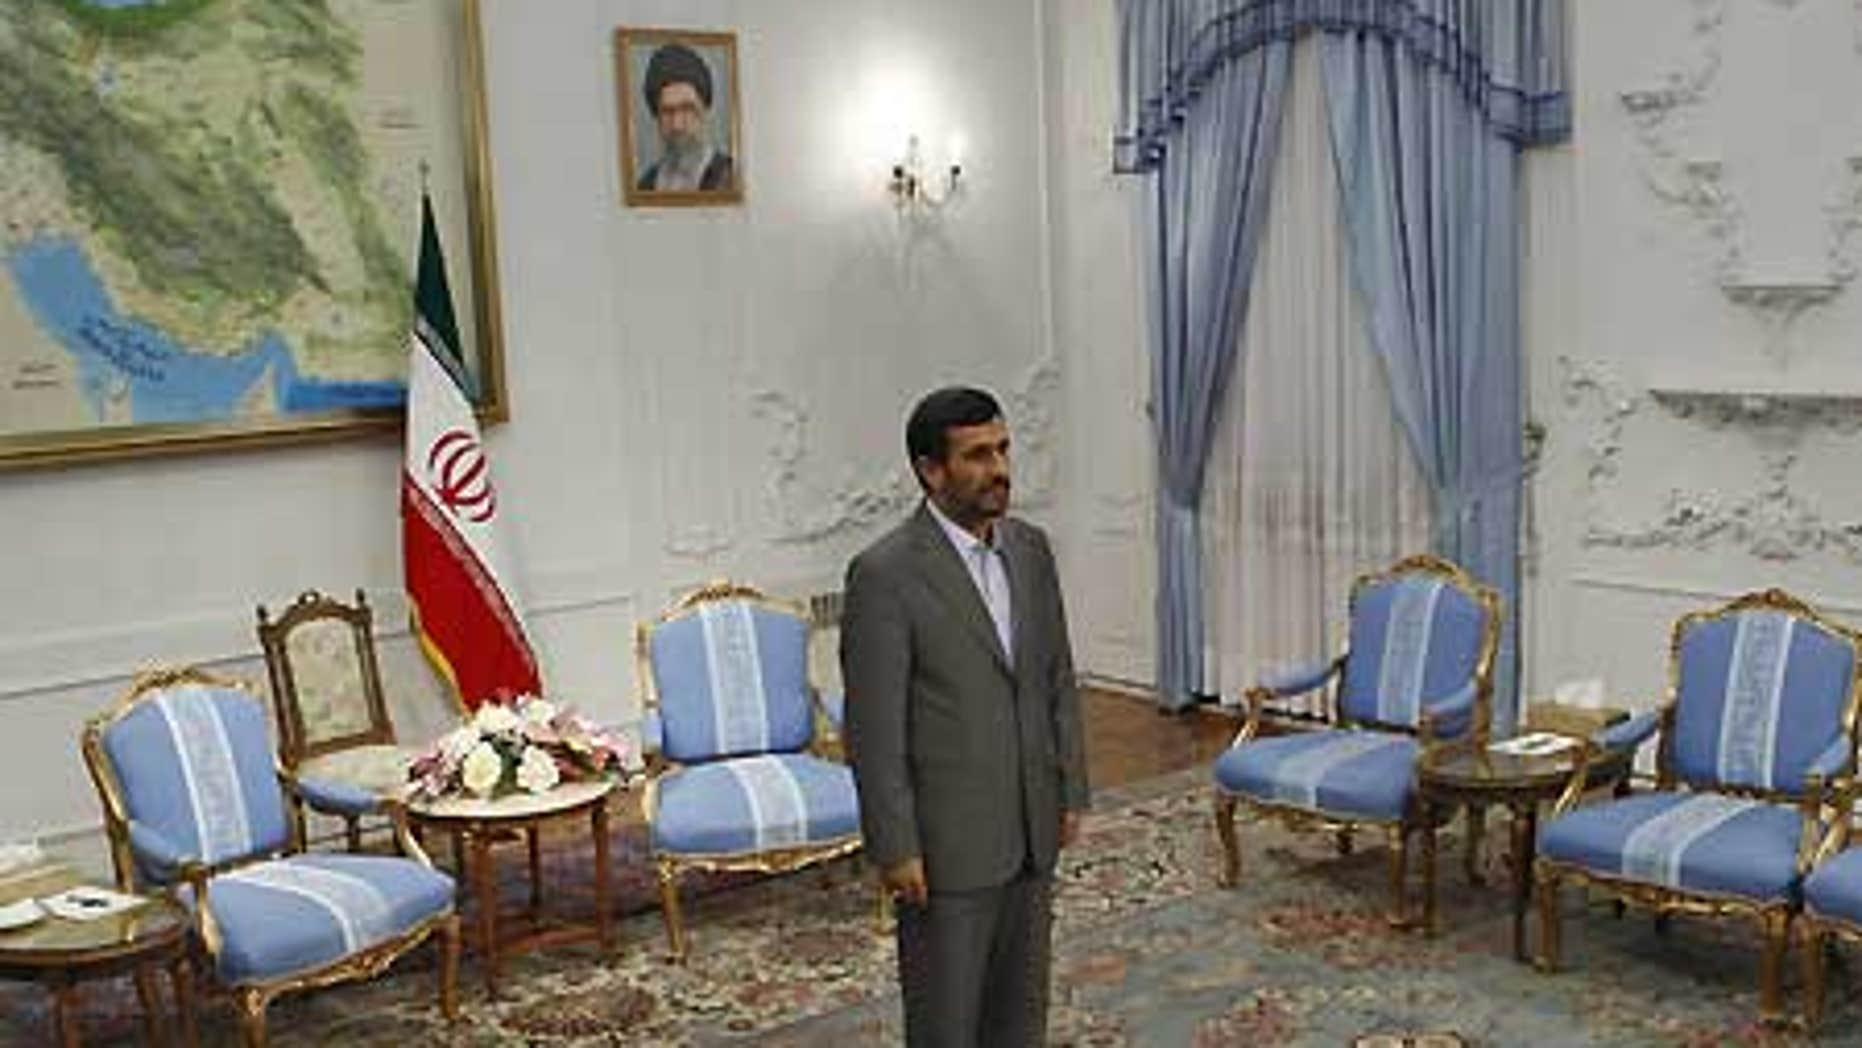 Sept. 7: Iranian President Mahmoud Ahmadinejad waits to meet the Iraqi parliament speaker, Ayad al-Samarraie.